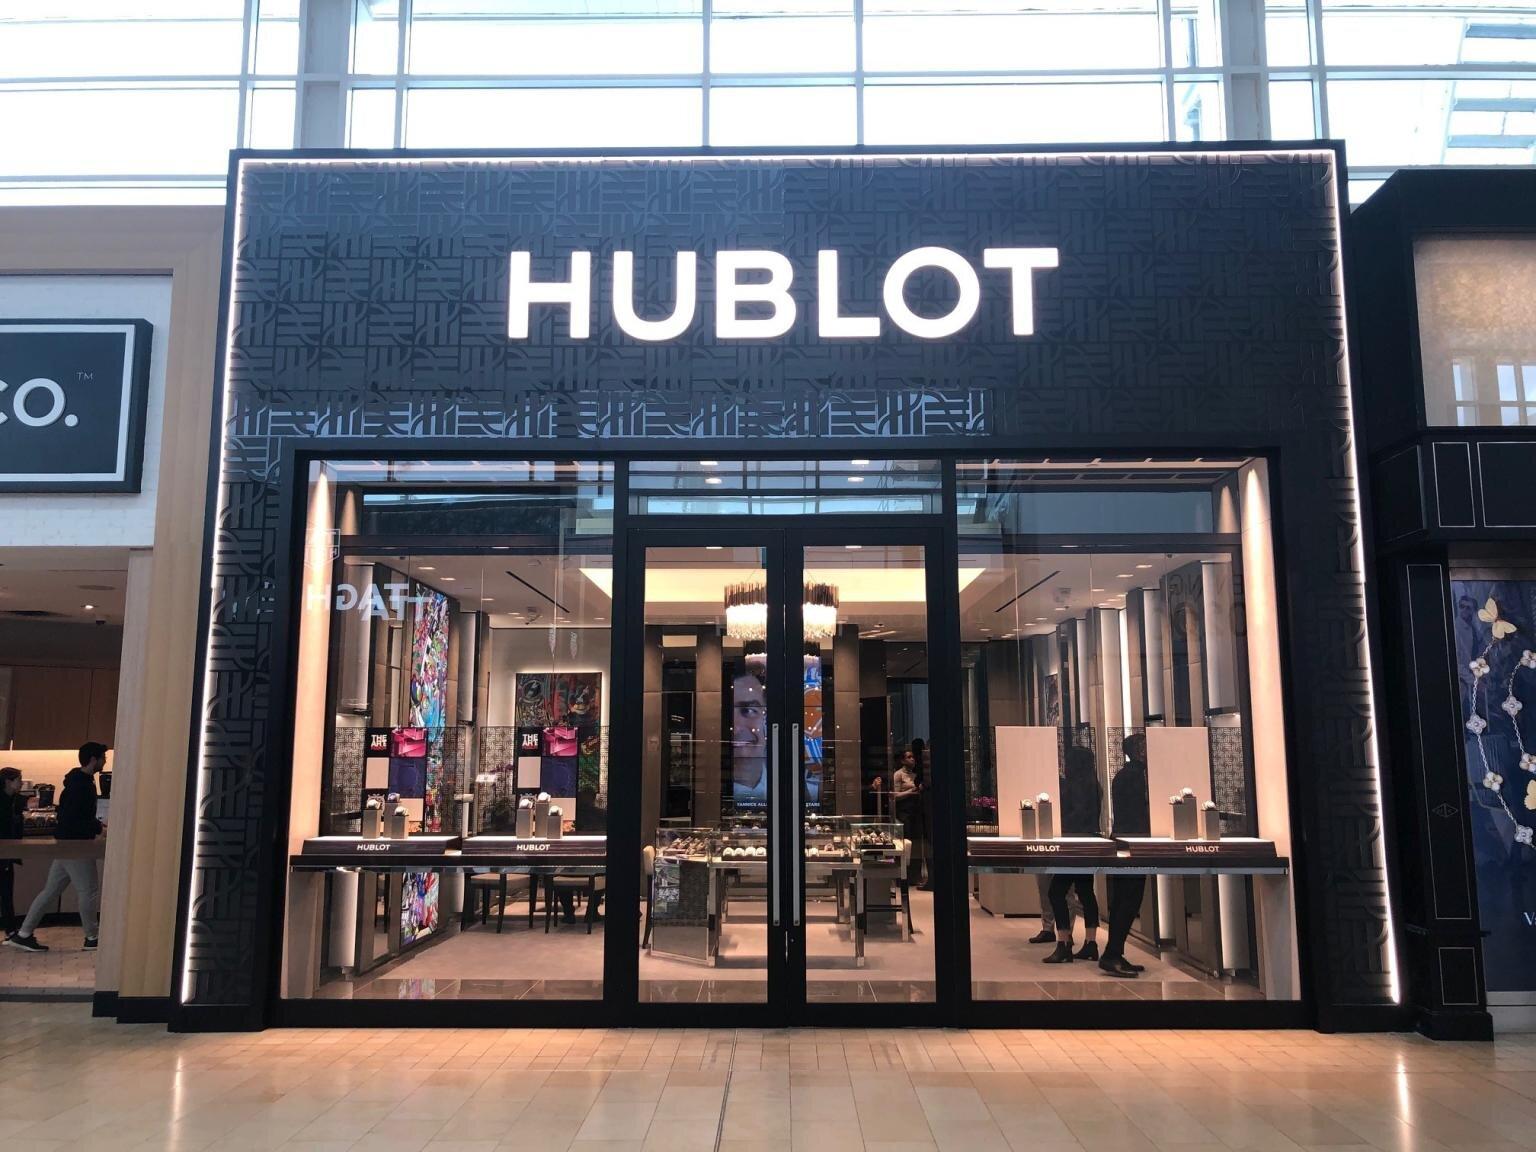 Photo of Hublot at Toronto's Yorkdale Shopping Centre. PHOTO: HUBLOT